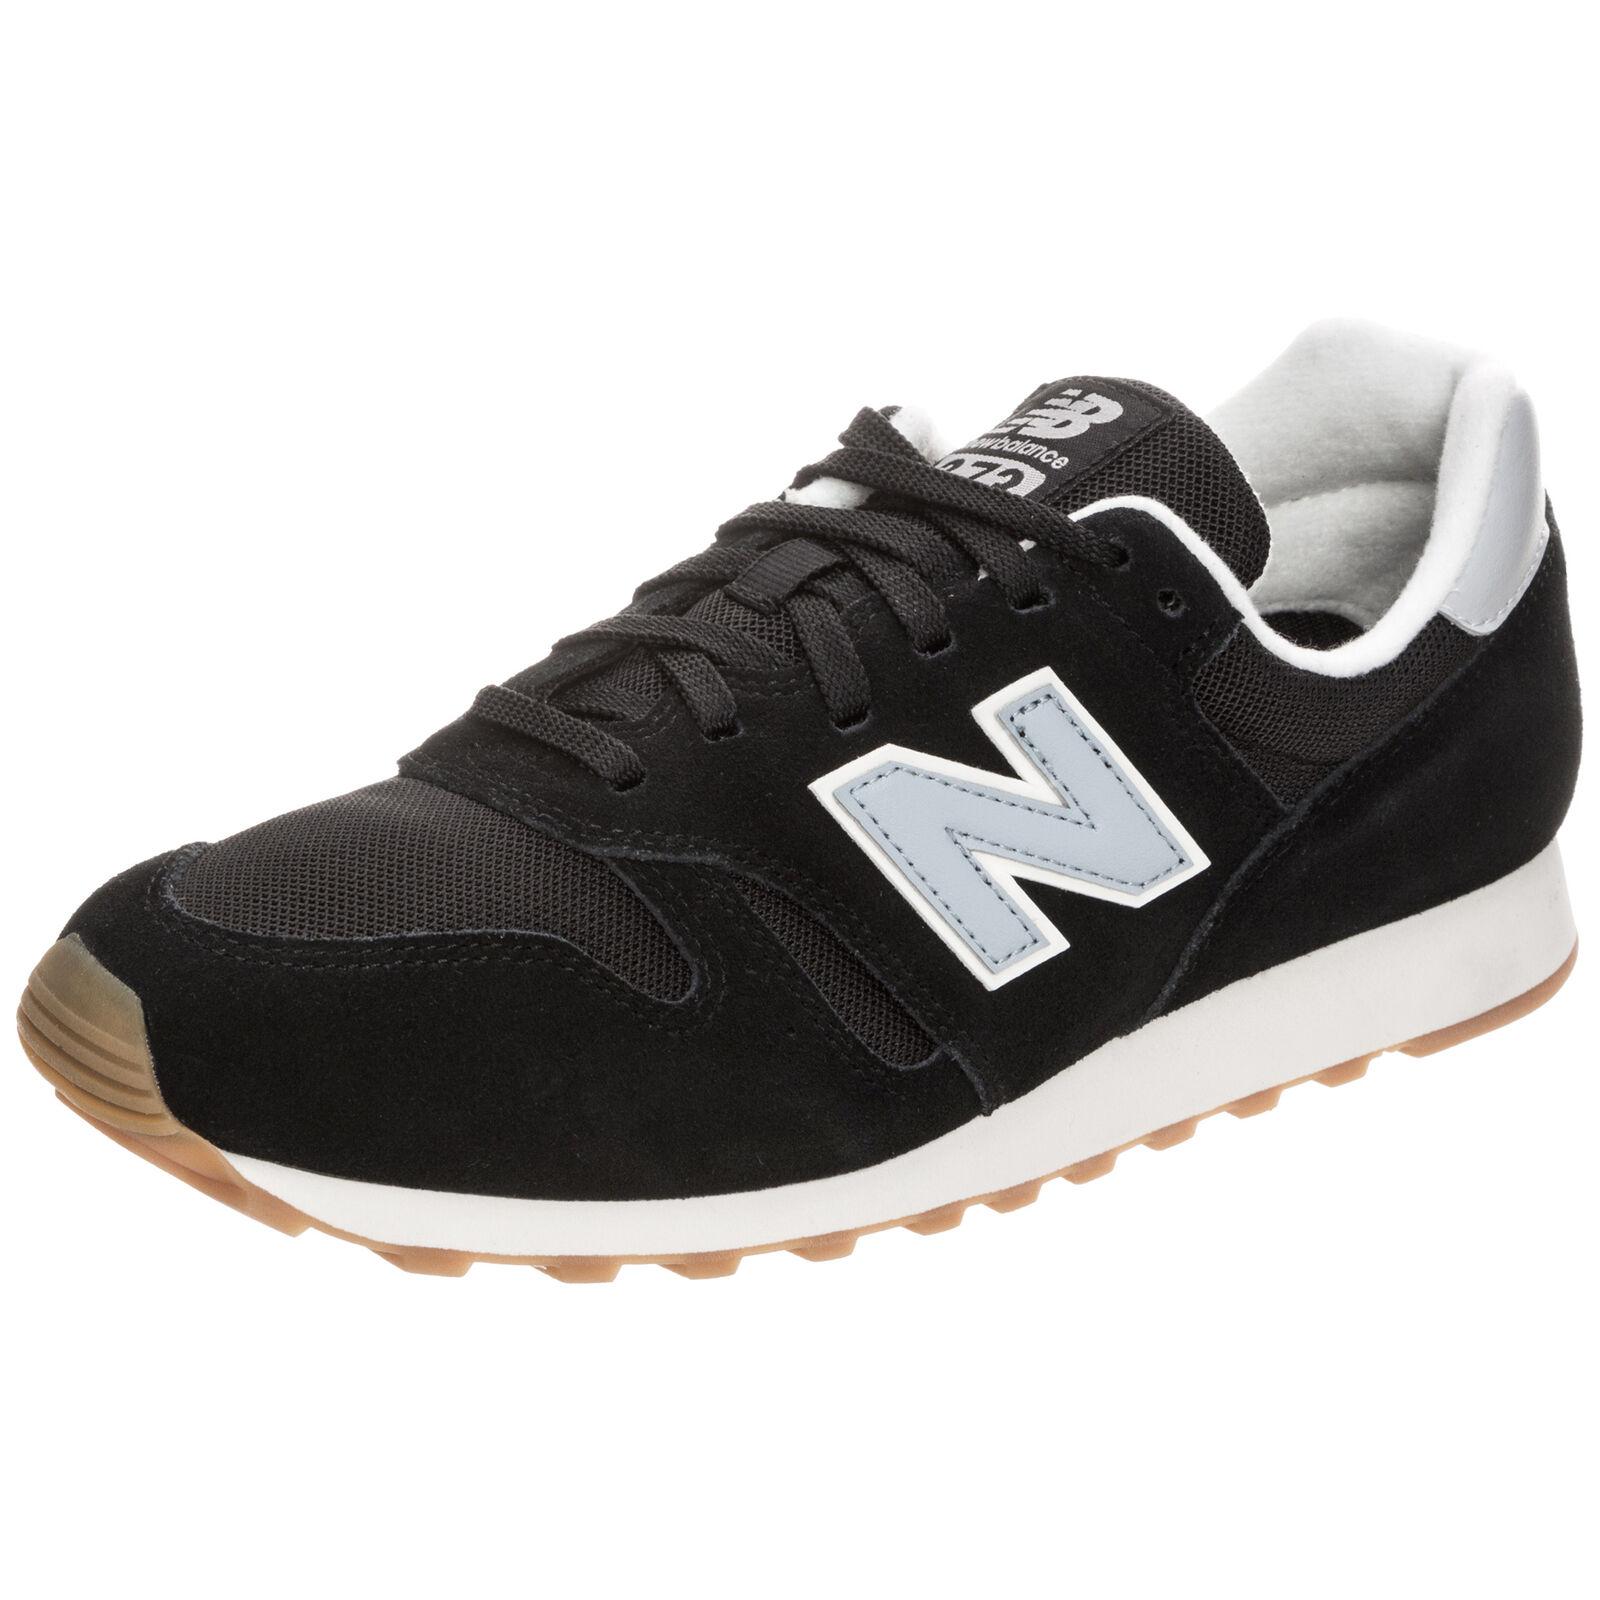 New Balance ML373-KBG-D Sneaker schwarz / hellblau NEU Schuhe Turnschuhe